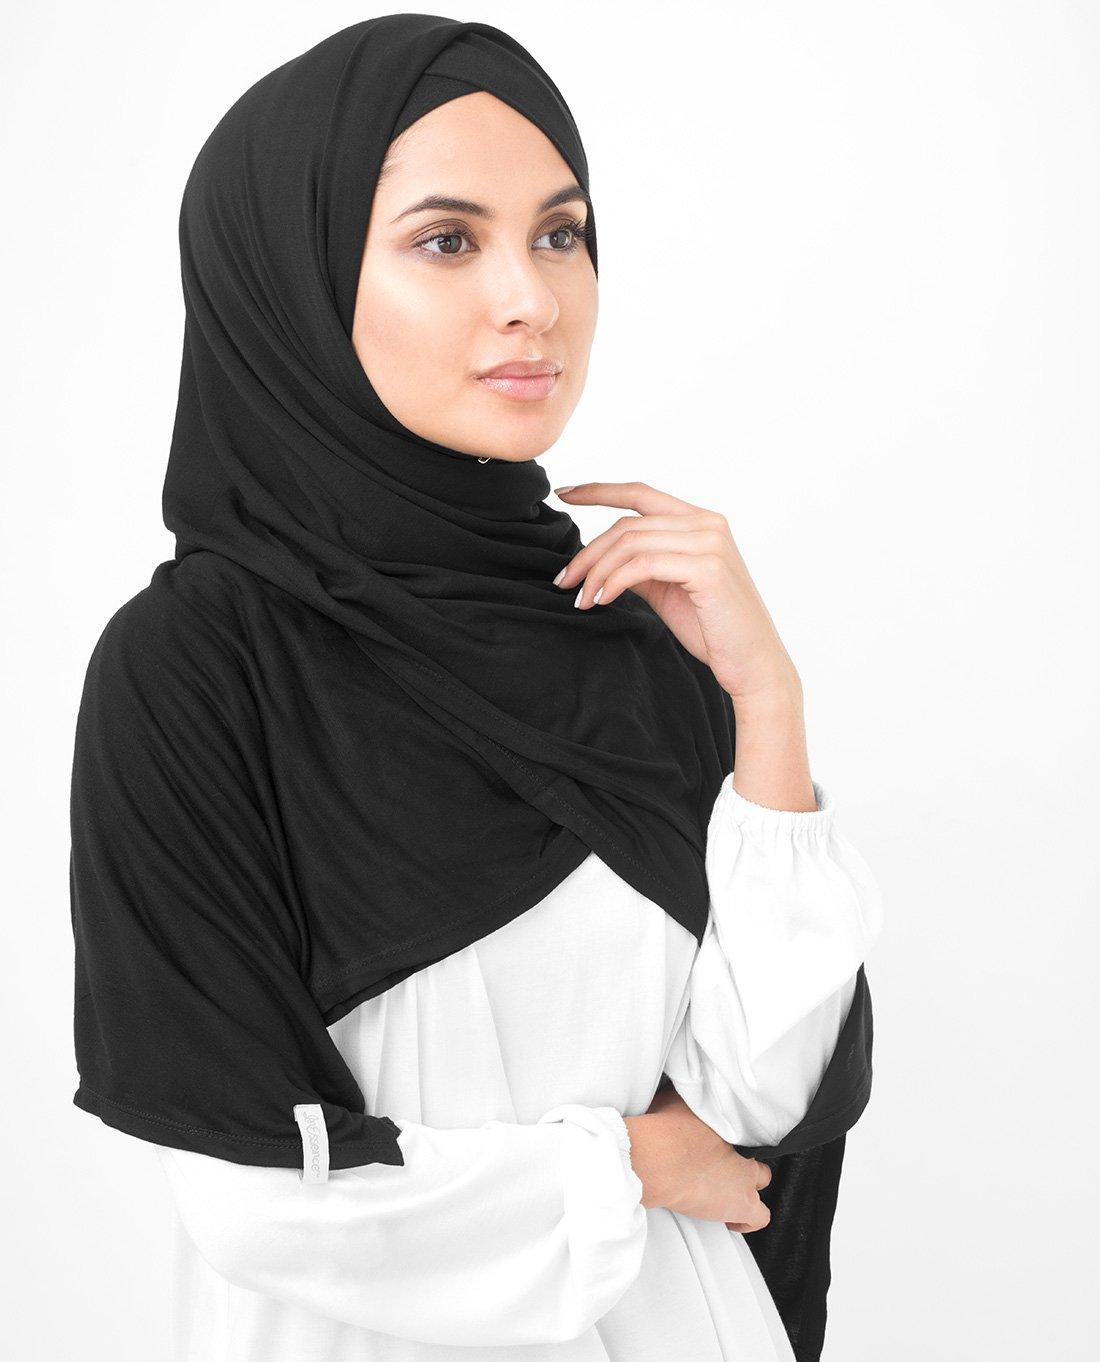 InEssence Jet Black Viscose Jersey Scarf Women Girls Wrap Medium Size Hijab by InEssence (Image #3)